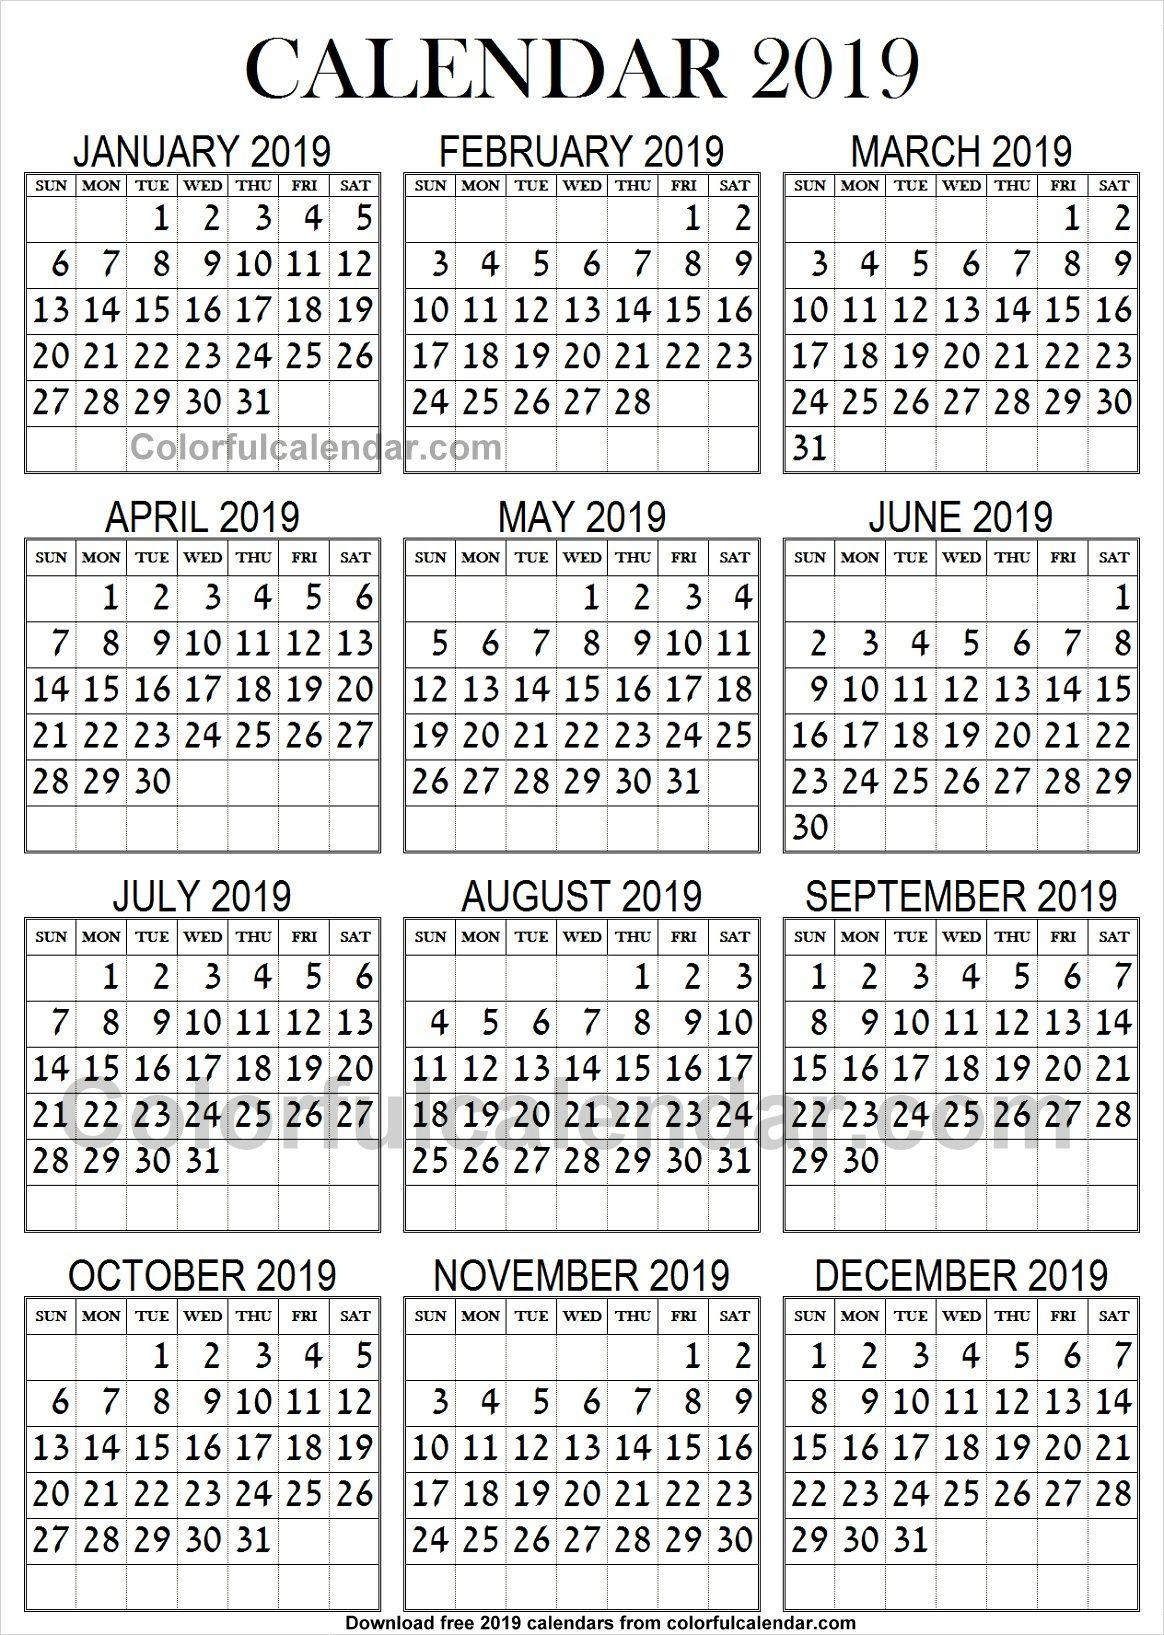 Large Calendar 2019 2019 Calendar Large Print | 2019 Yearly Calendars | 2019 calendar